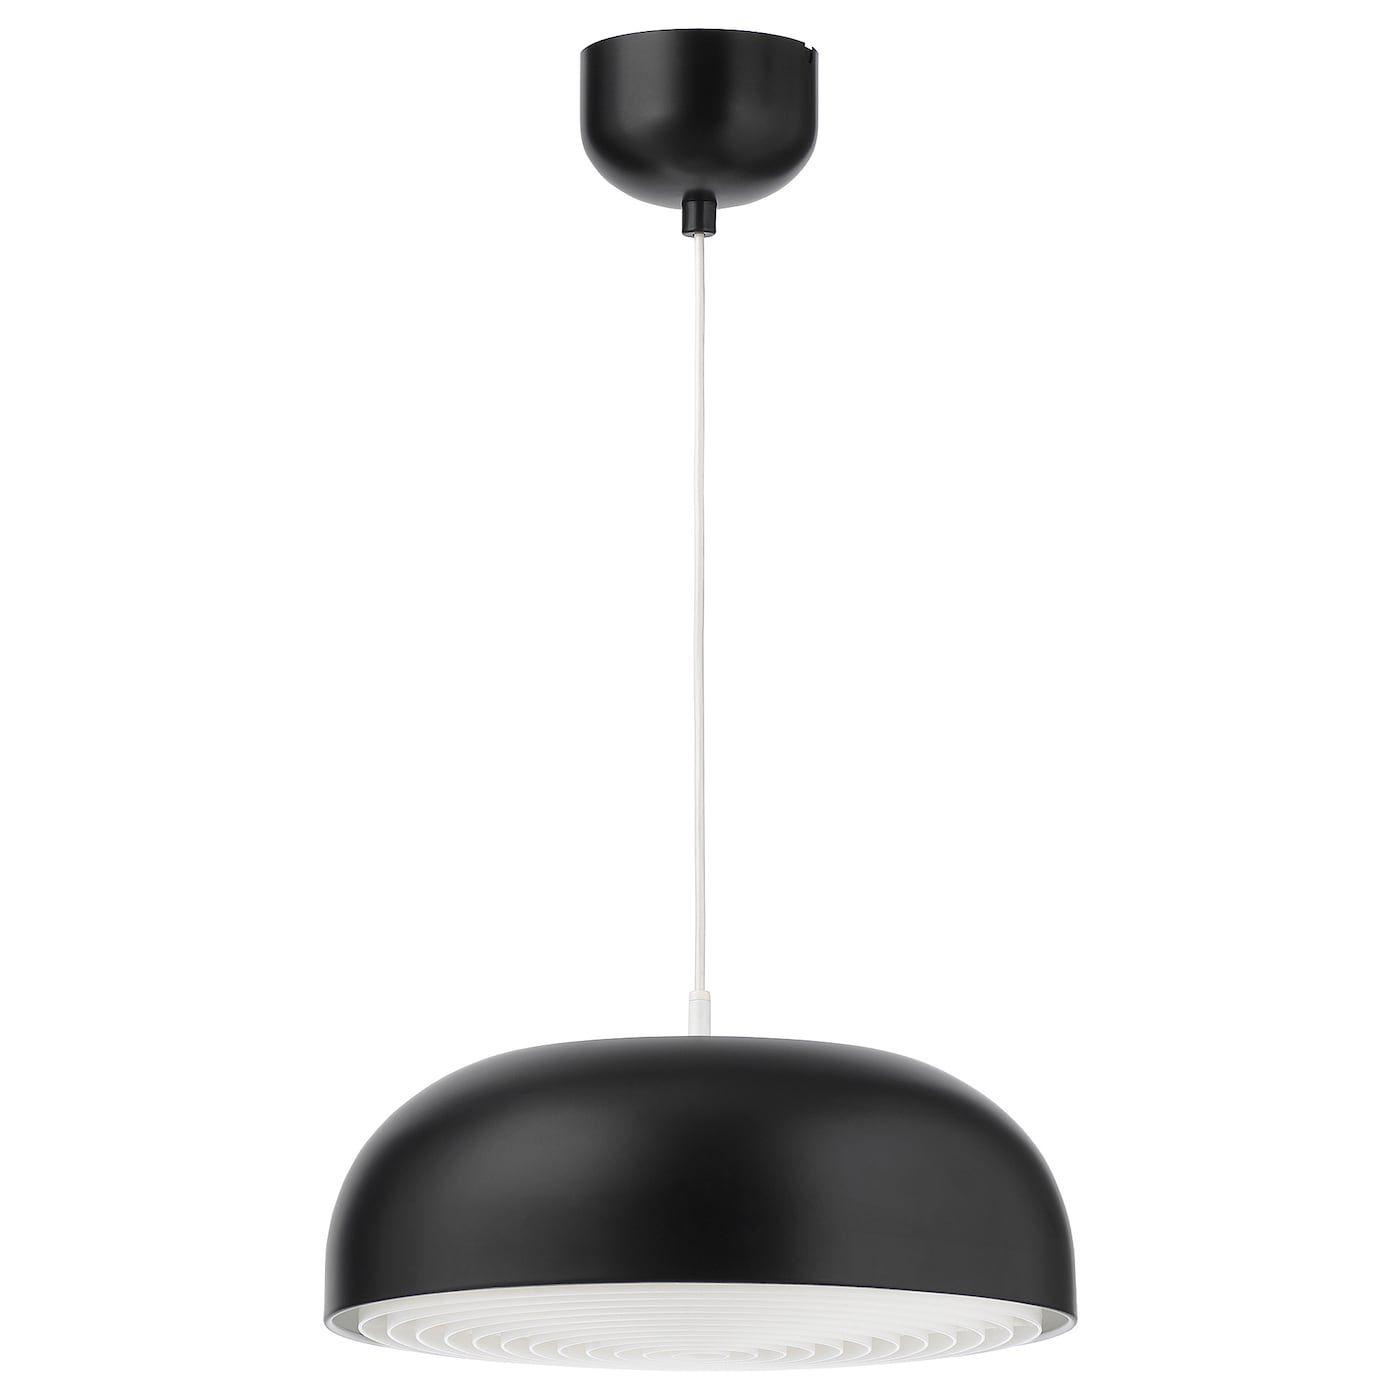 Hektar Pendant Lamp Dark Gray 15 38 Cm